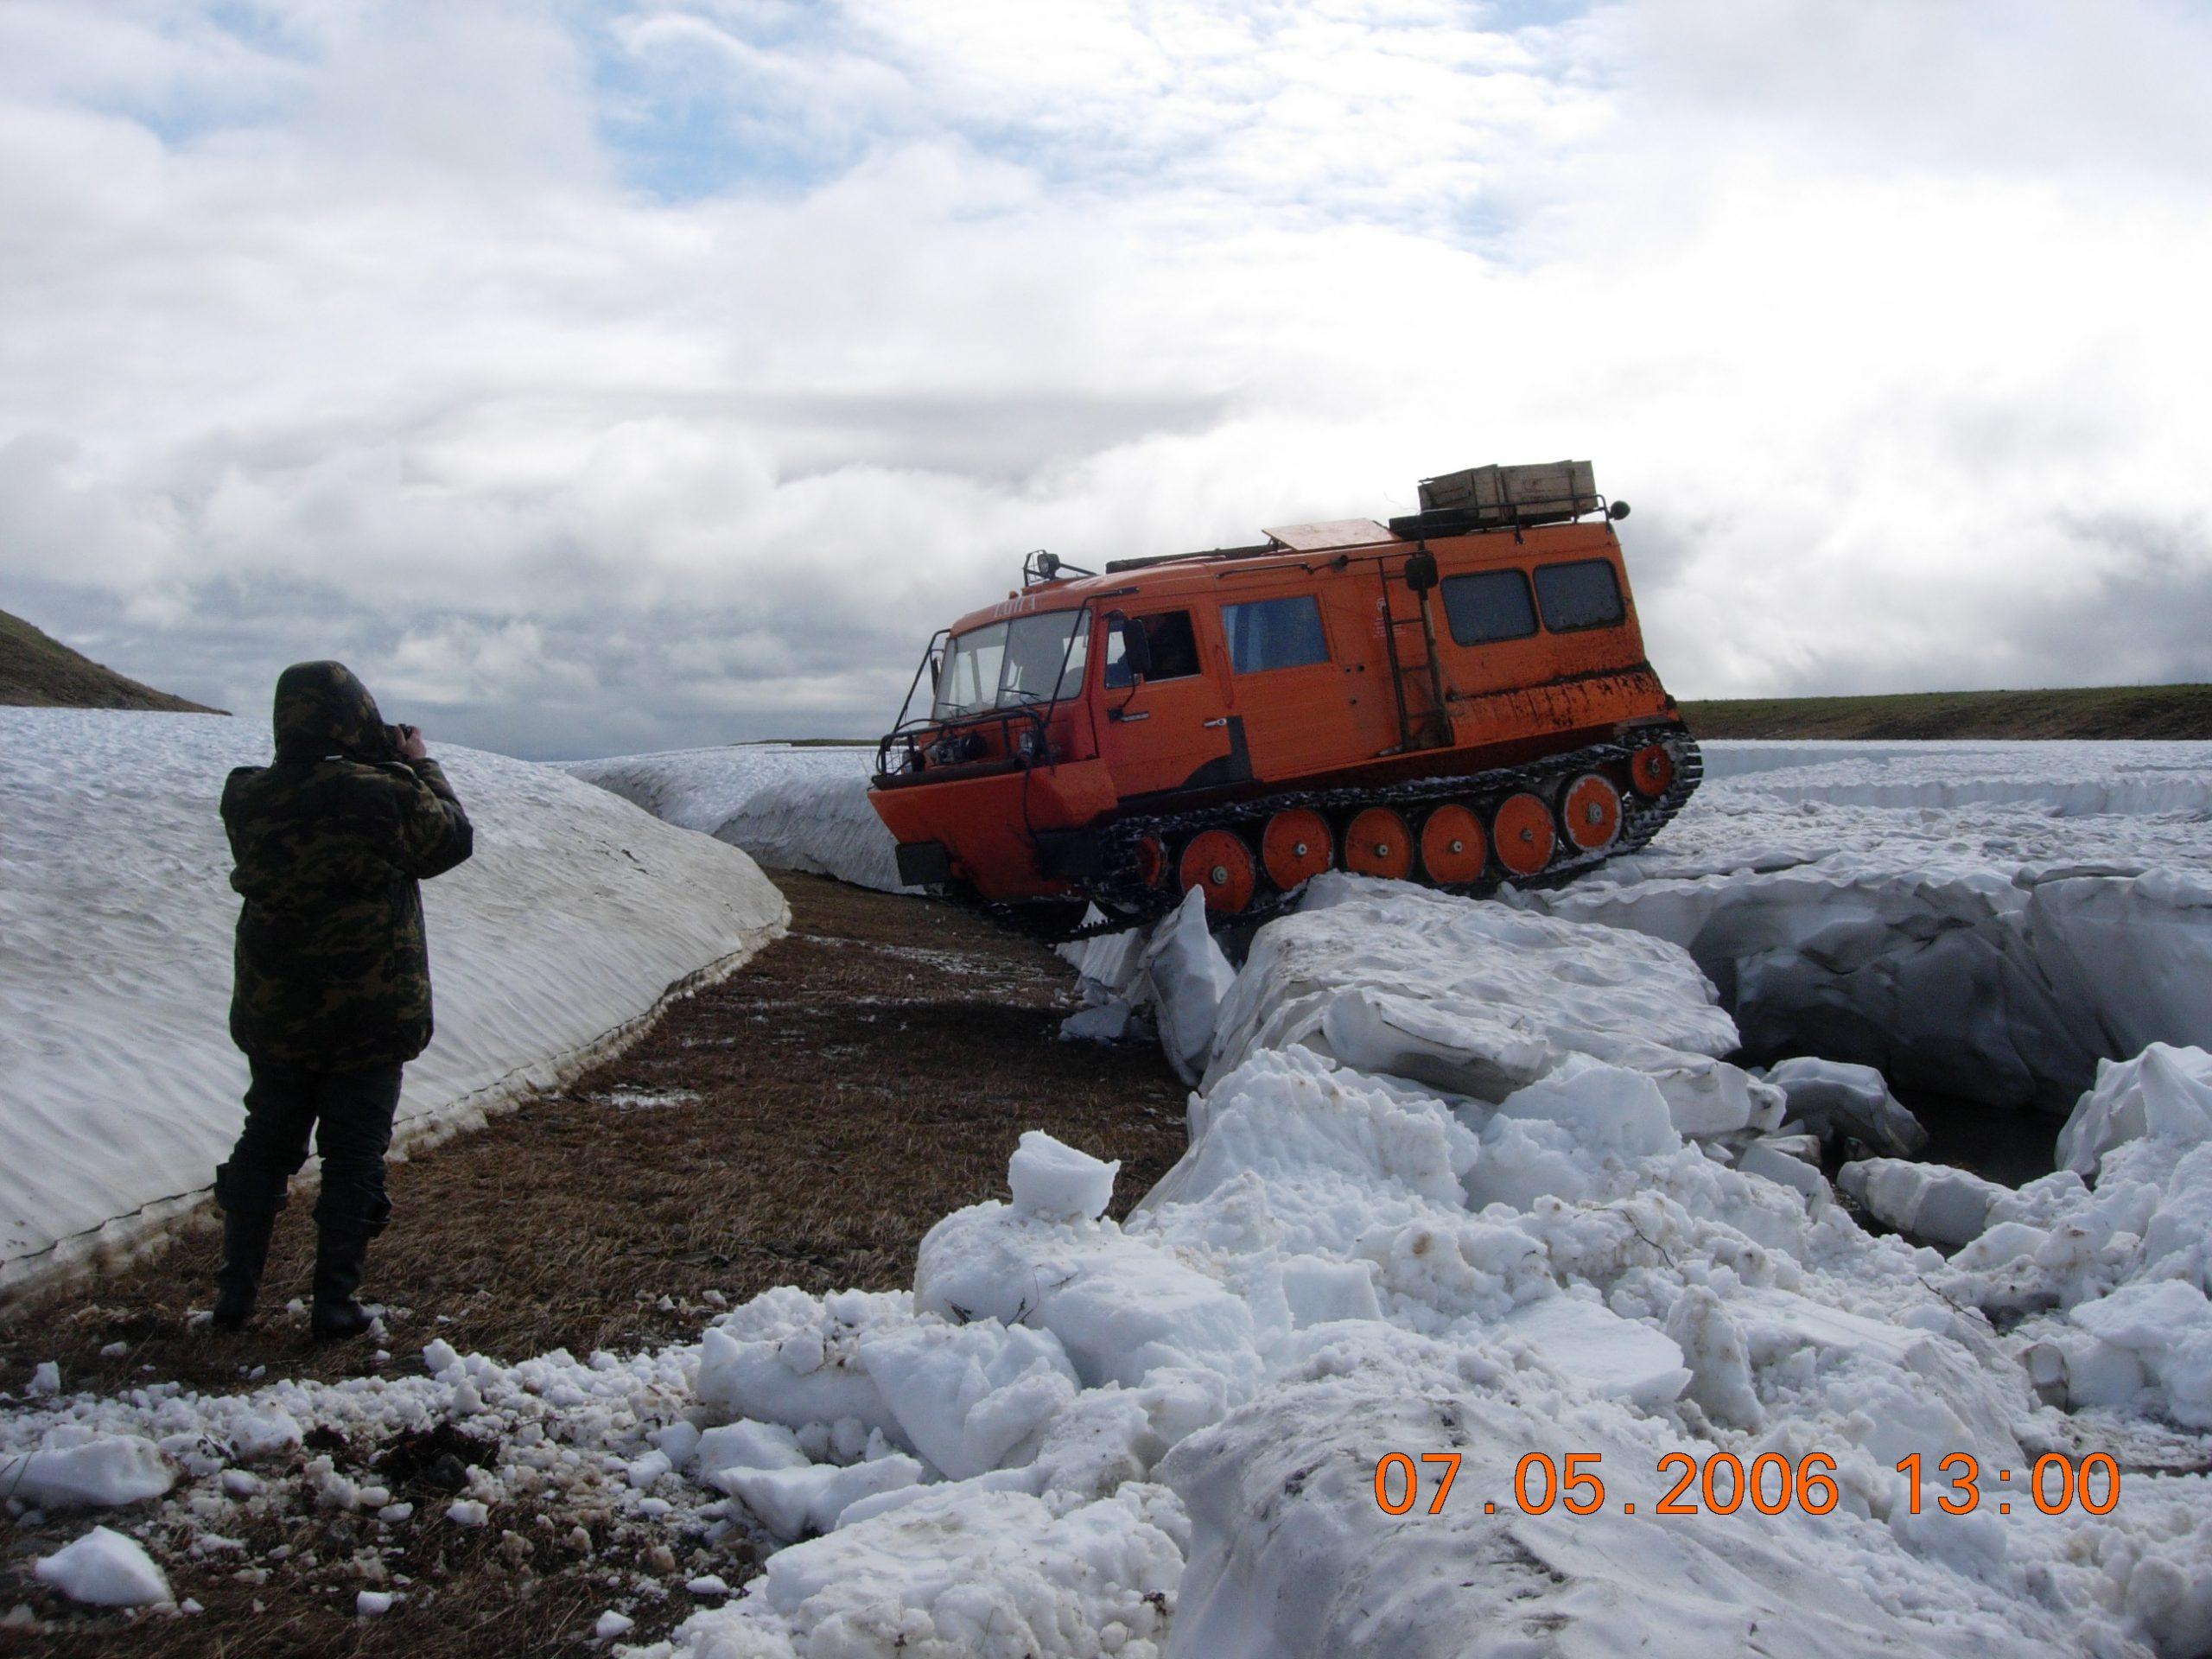 Установка буровая шнековая малогабаритная УБШМ-1-13 на базе ГАЗ 34039